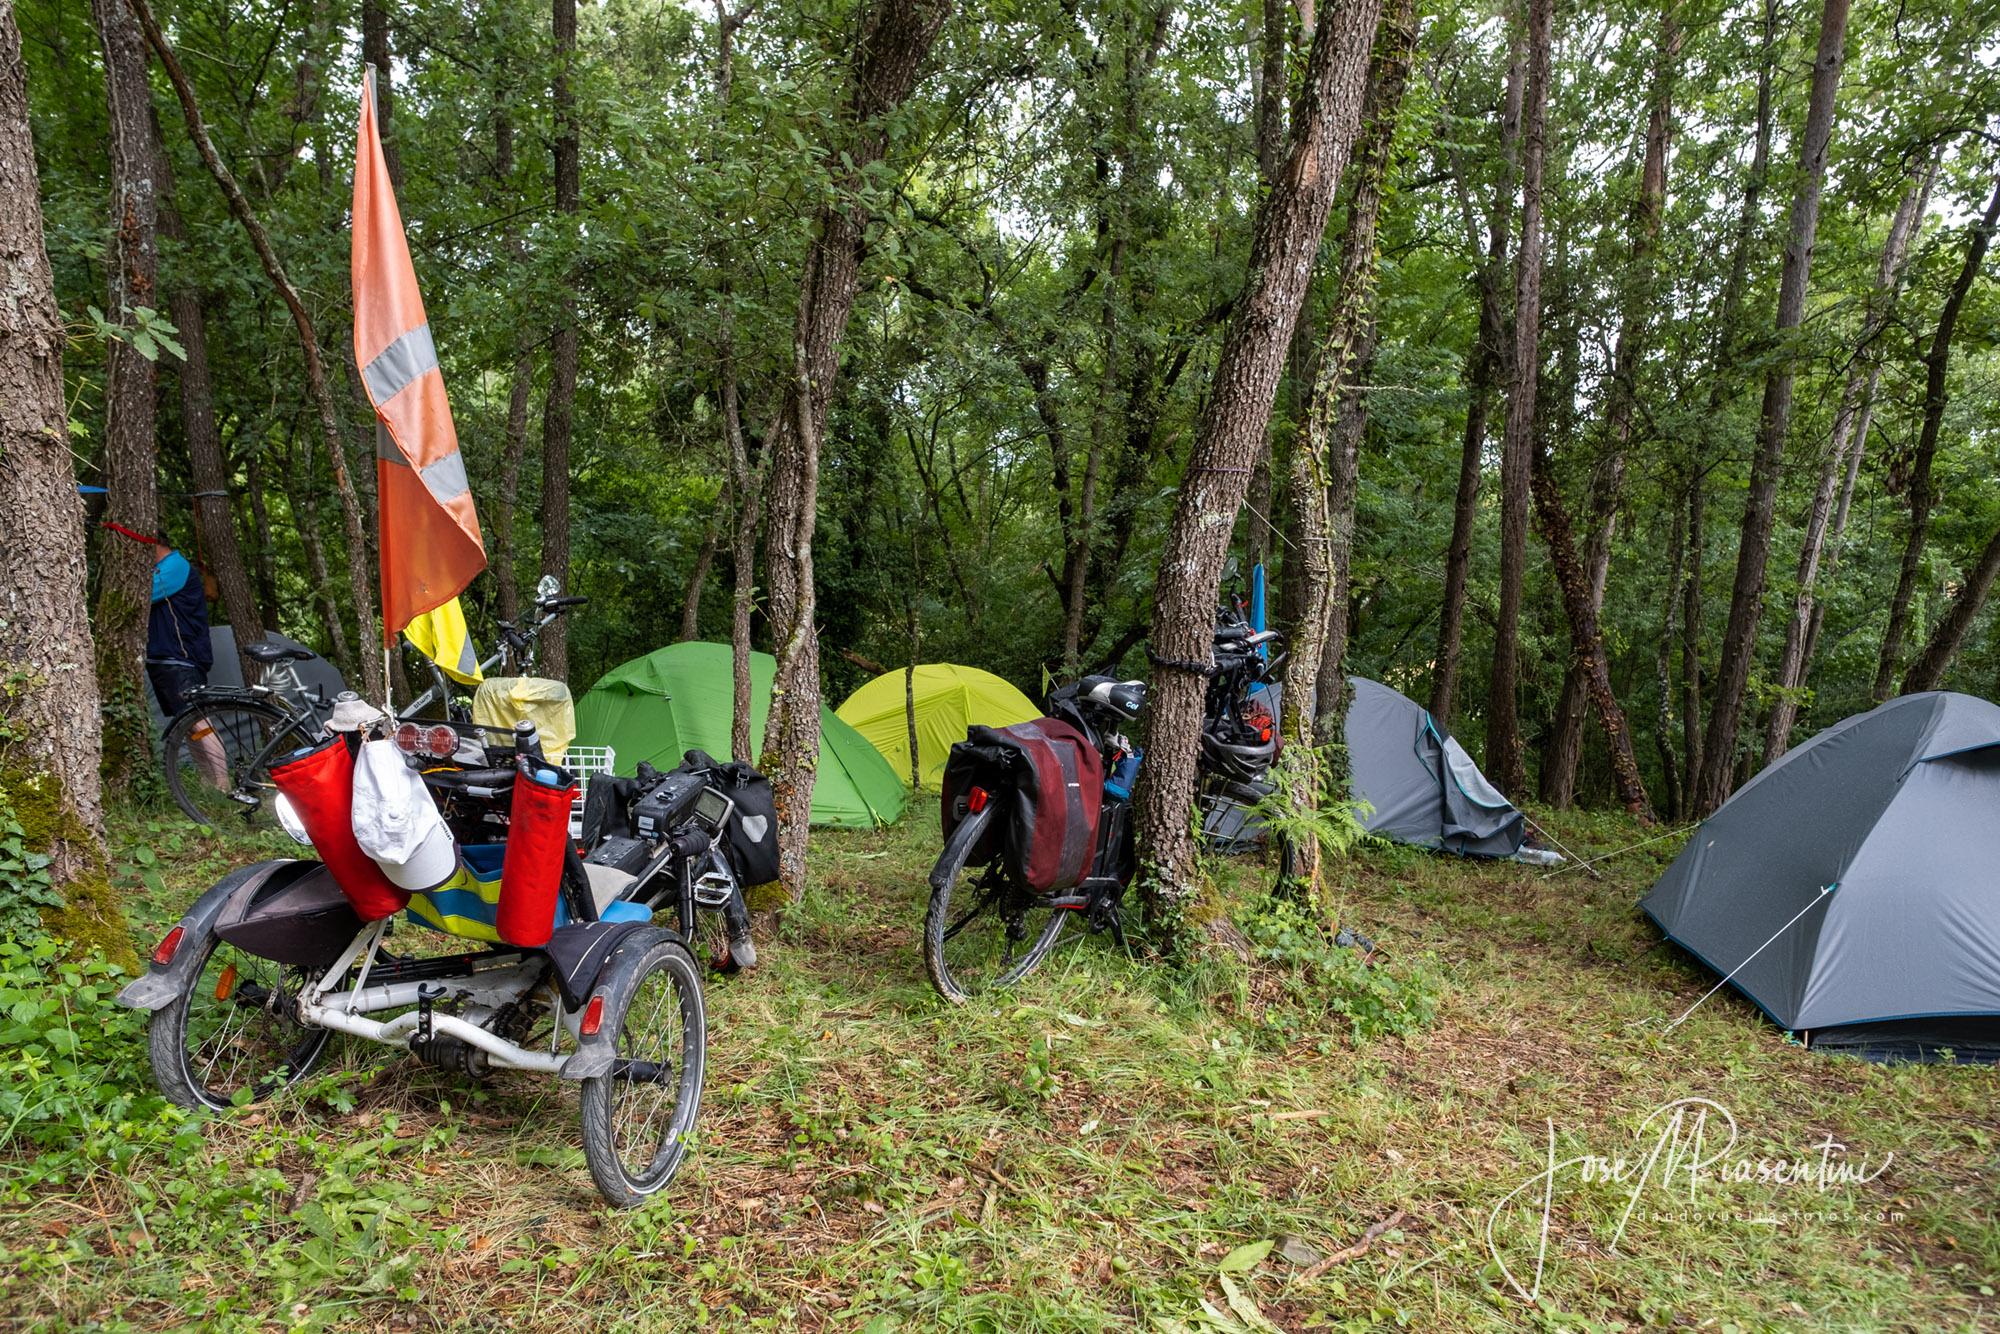 Cicloviajeros meeting camper